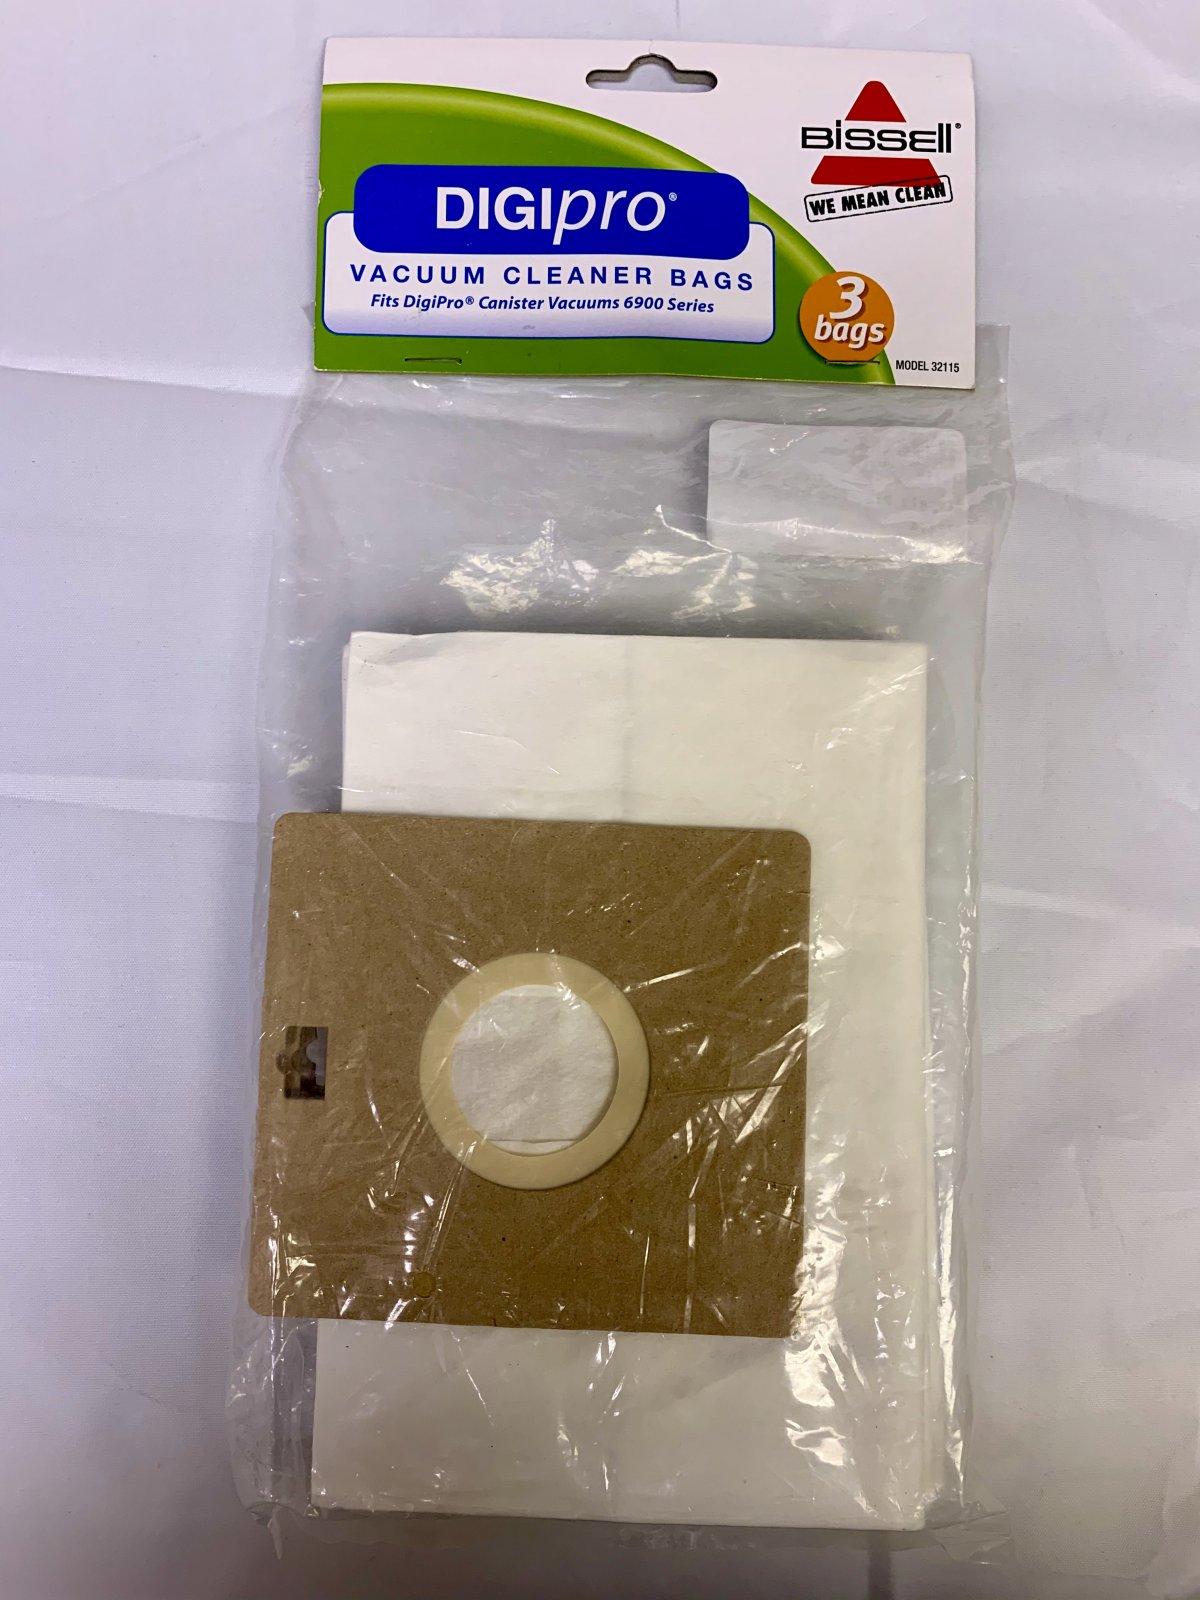 Bissell Bags Digi Pro 32115